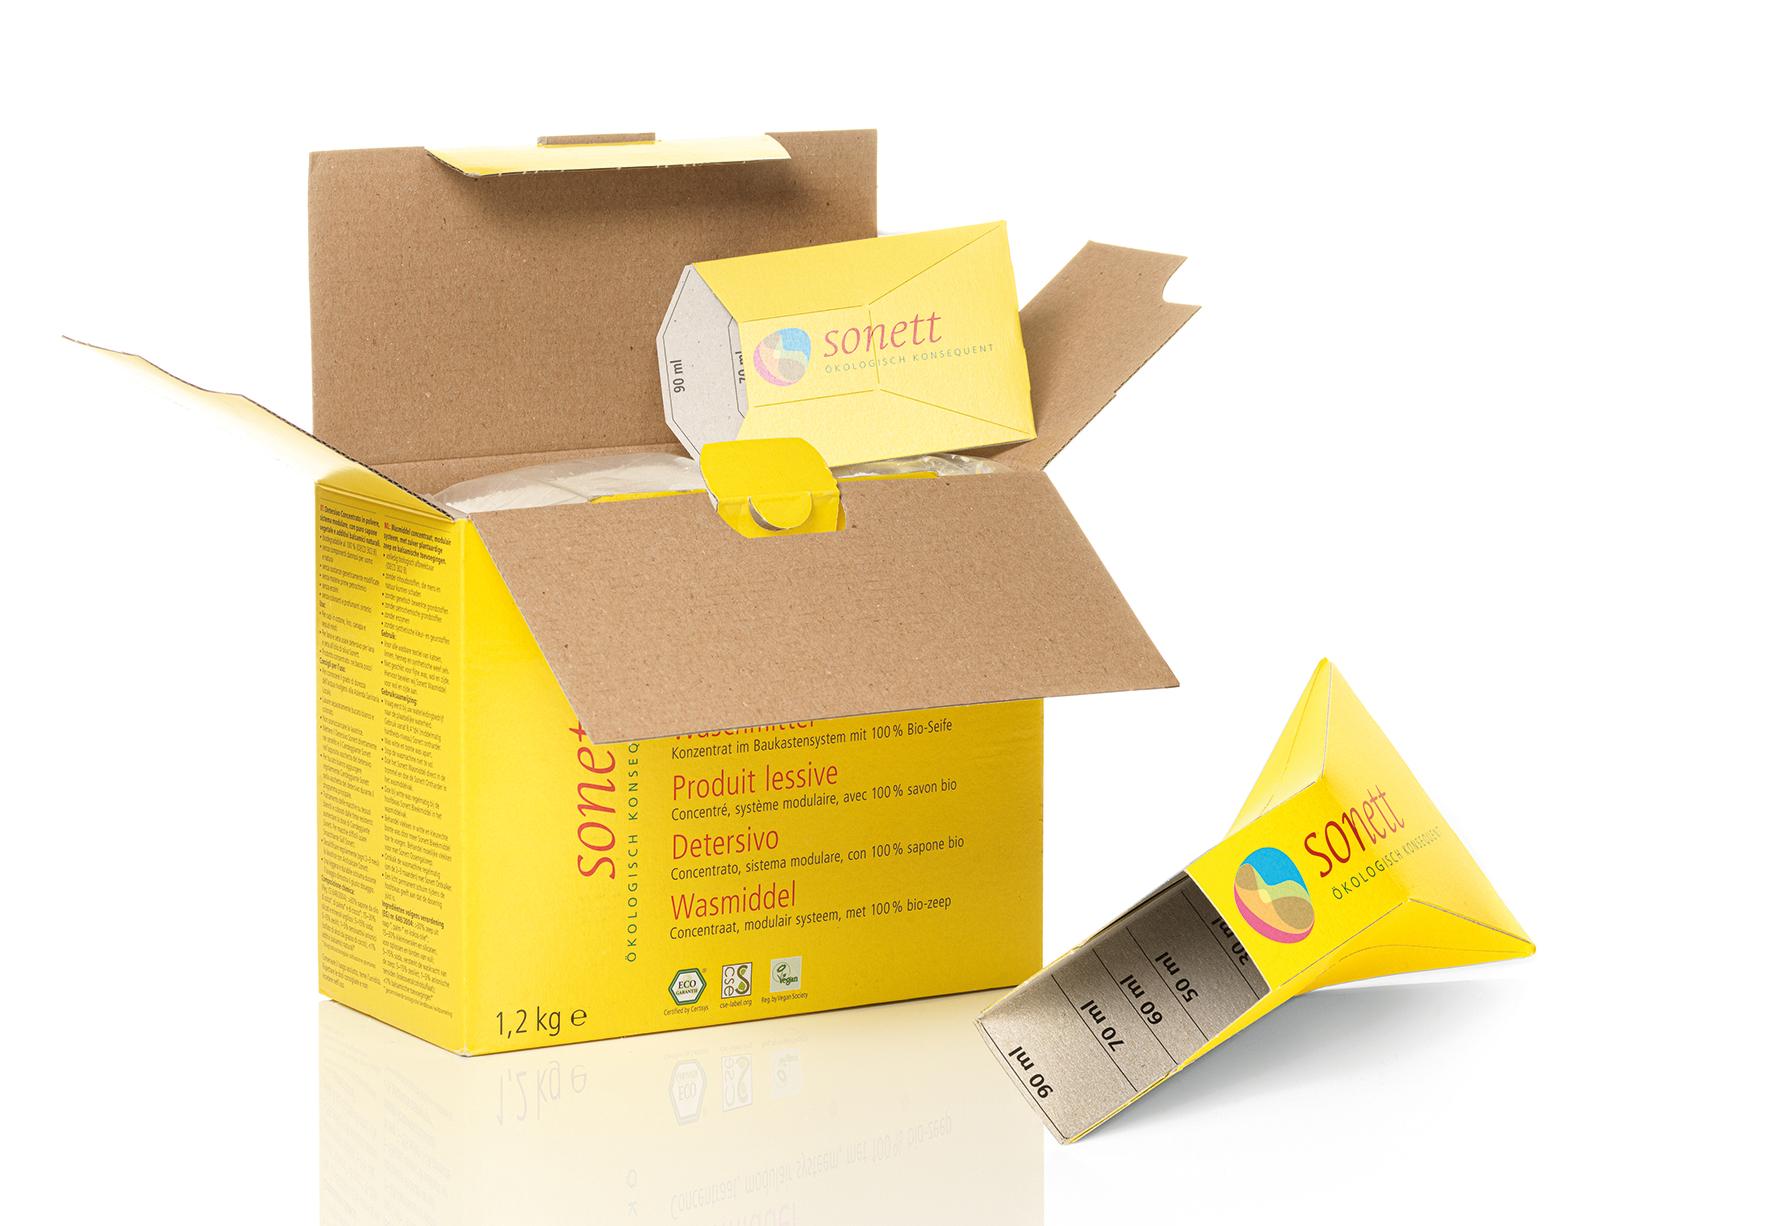 carton-award-image 212359